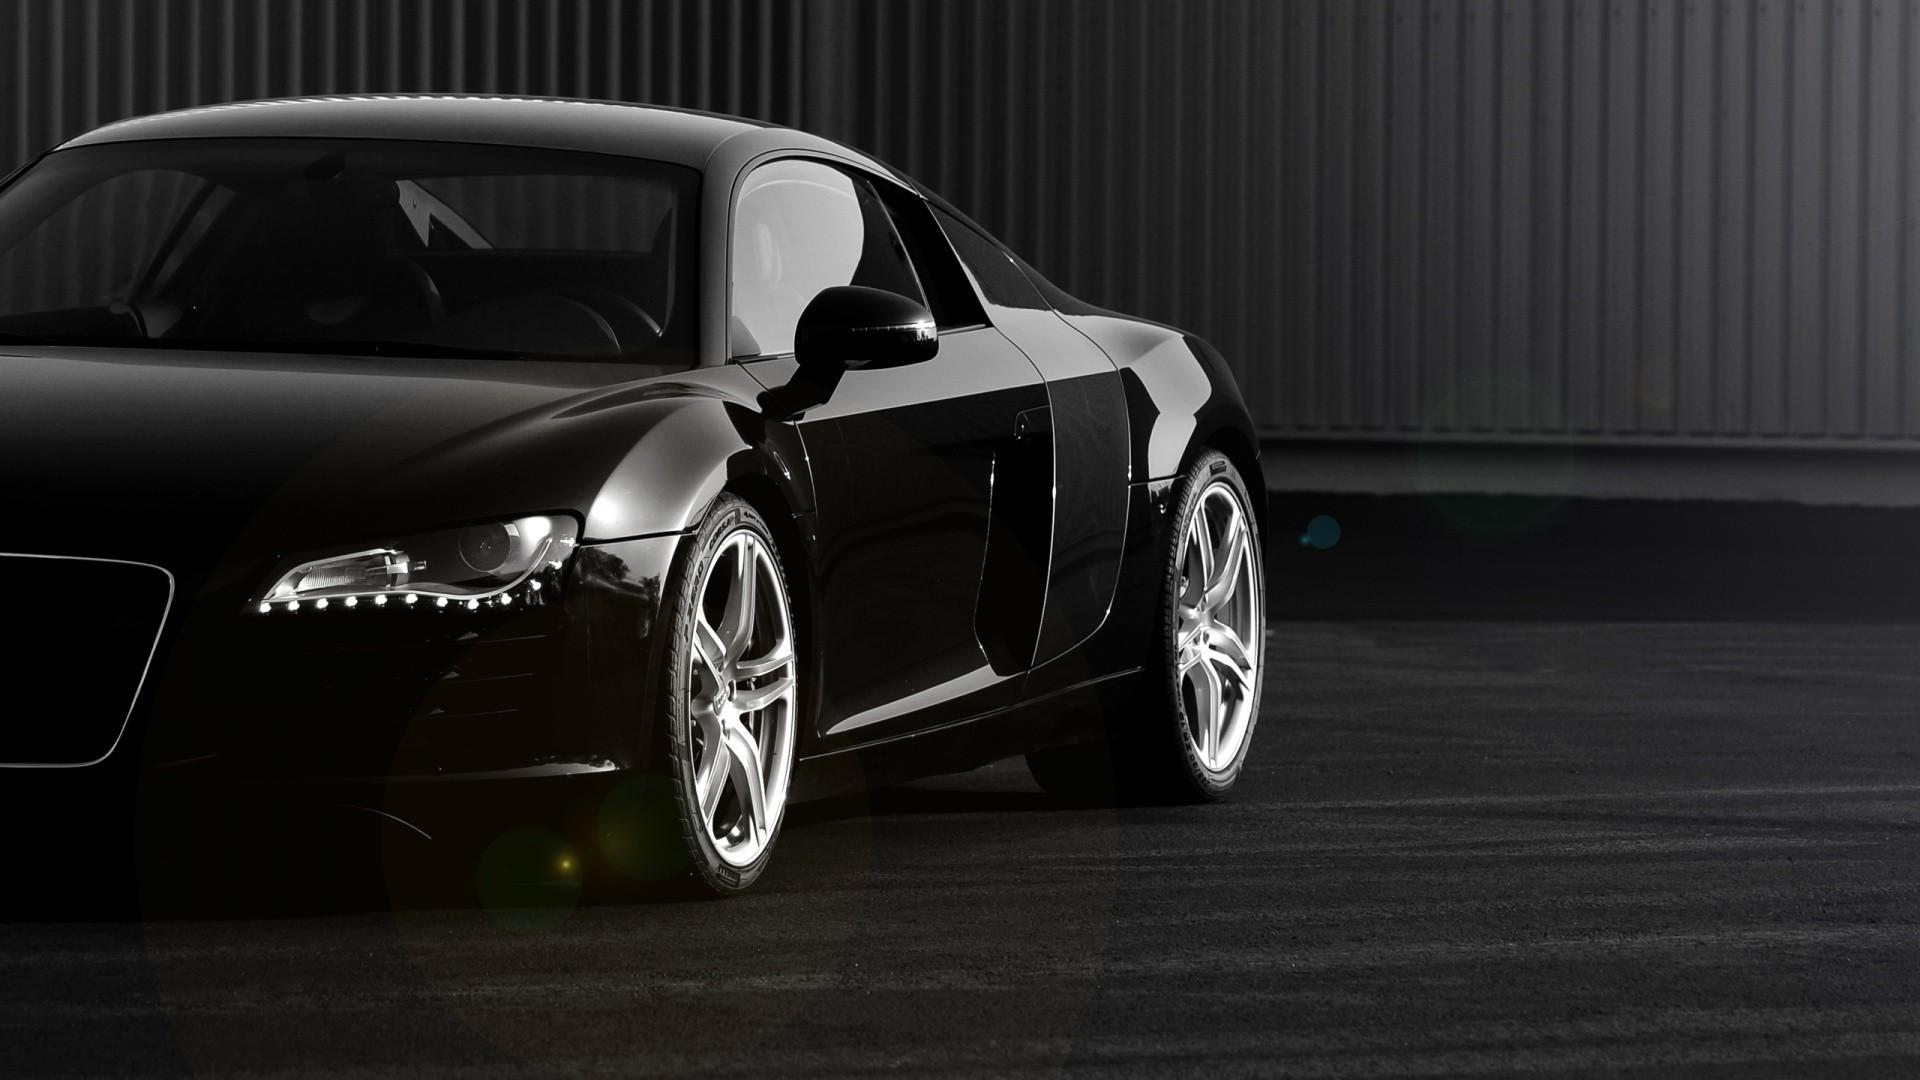 Black Audi R8 Section